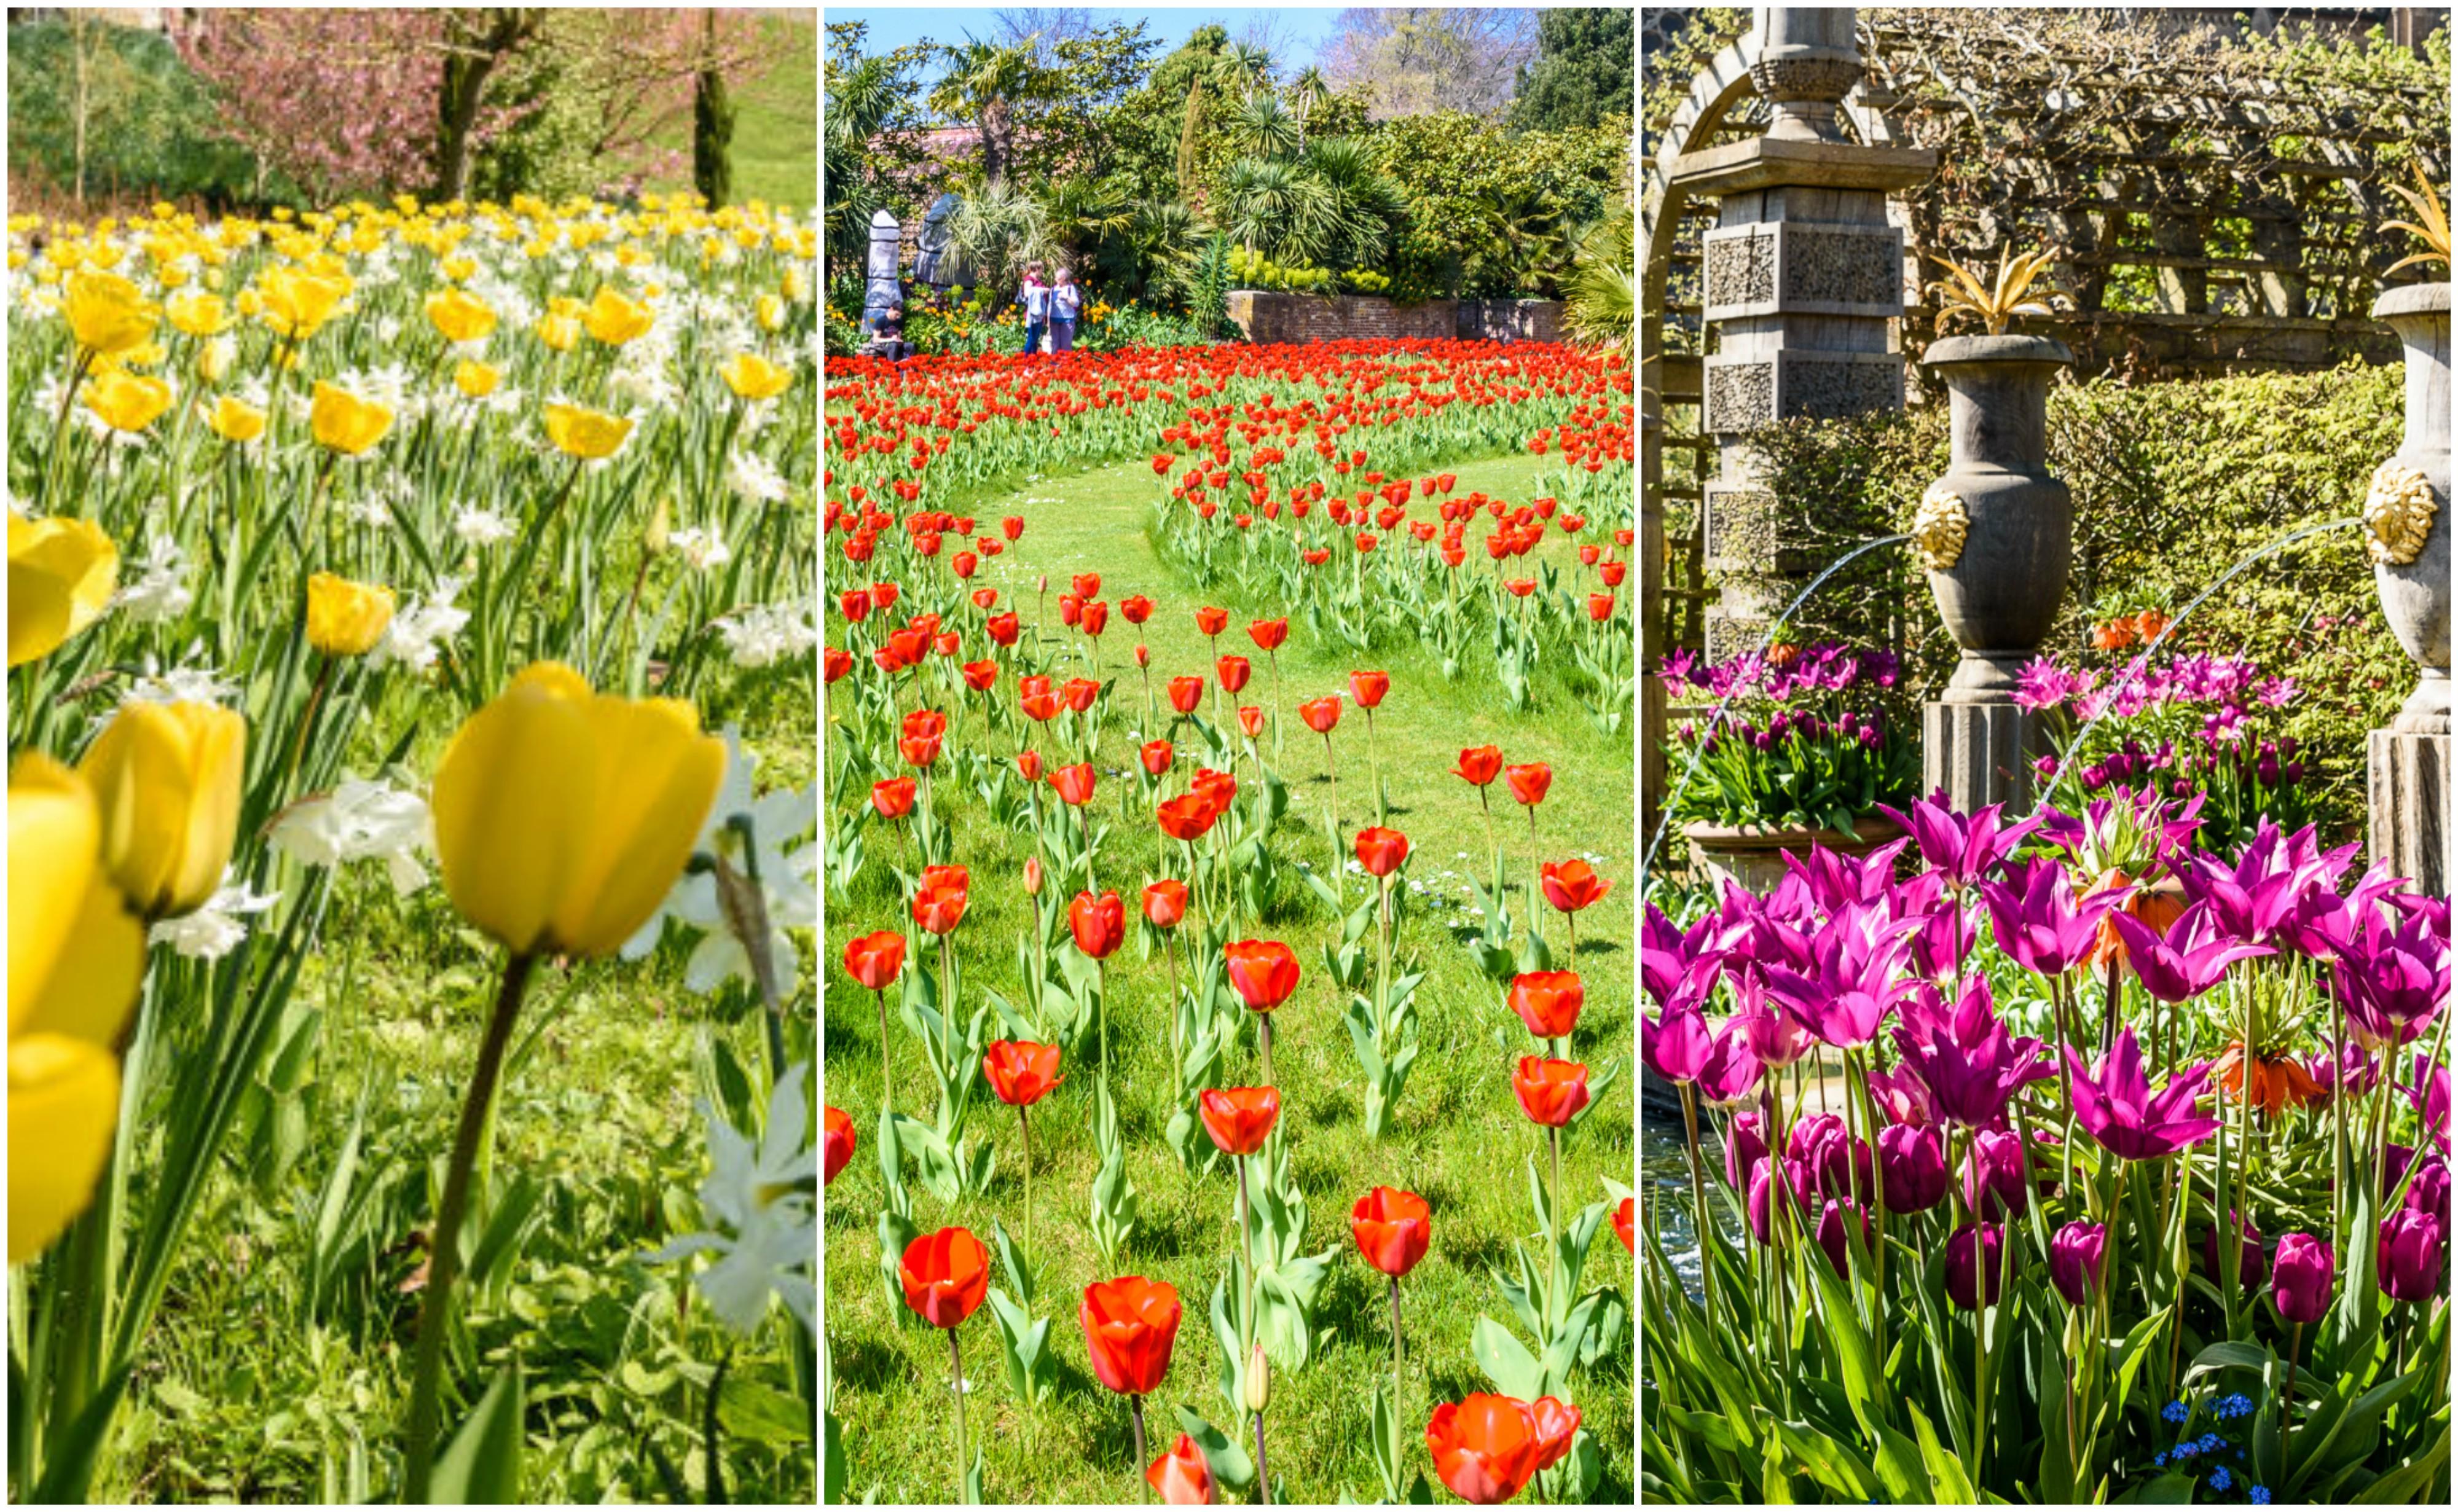 arundel castle 39 s annual tulip festival 2017 is simply